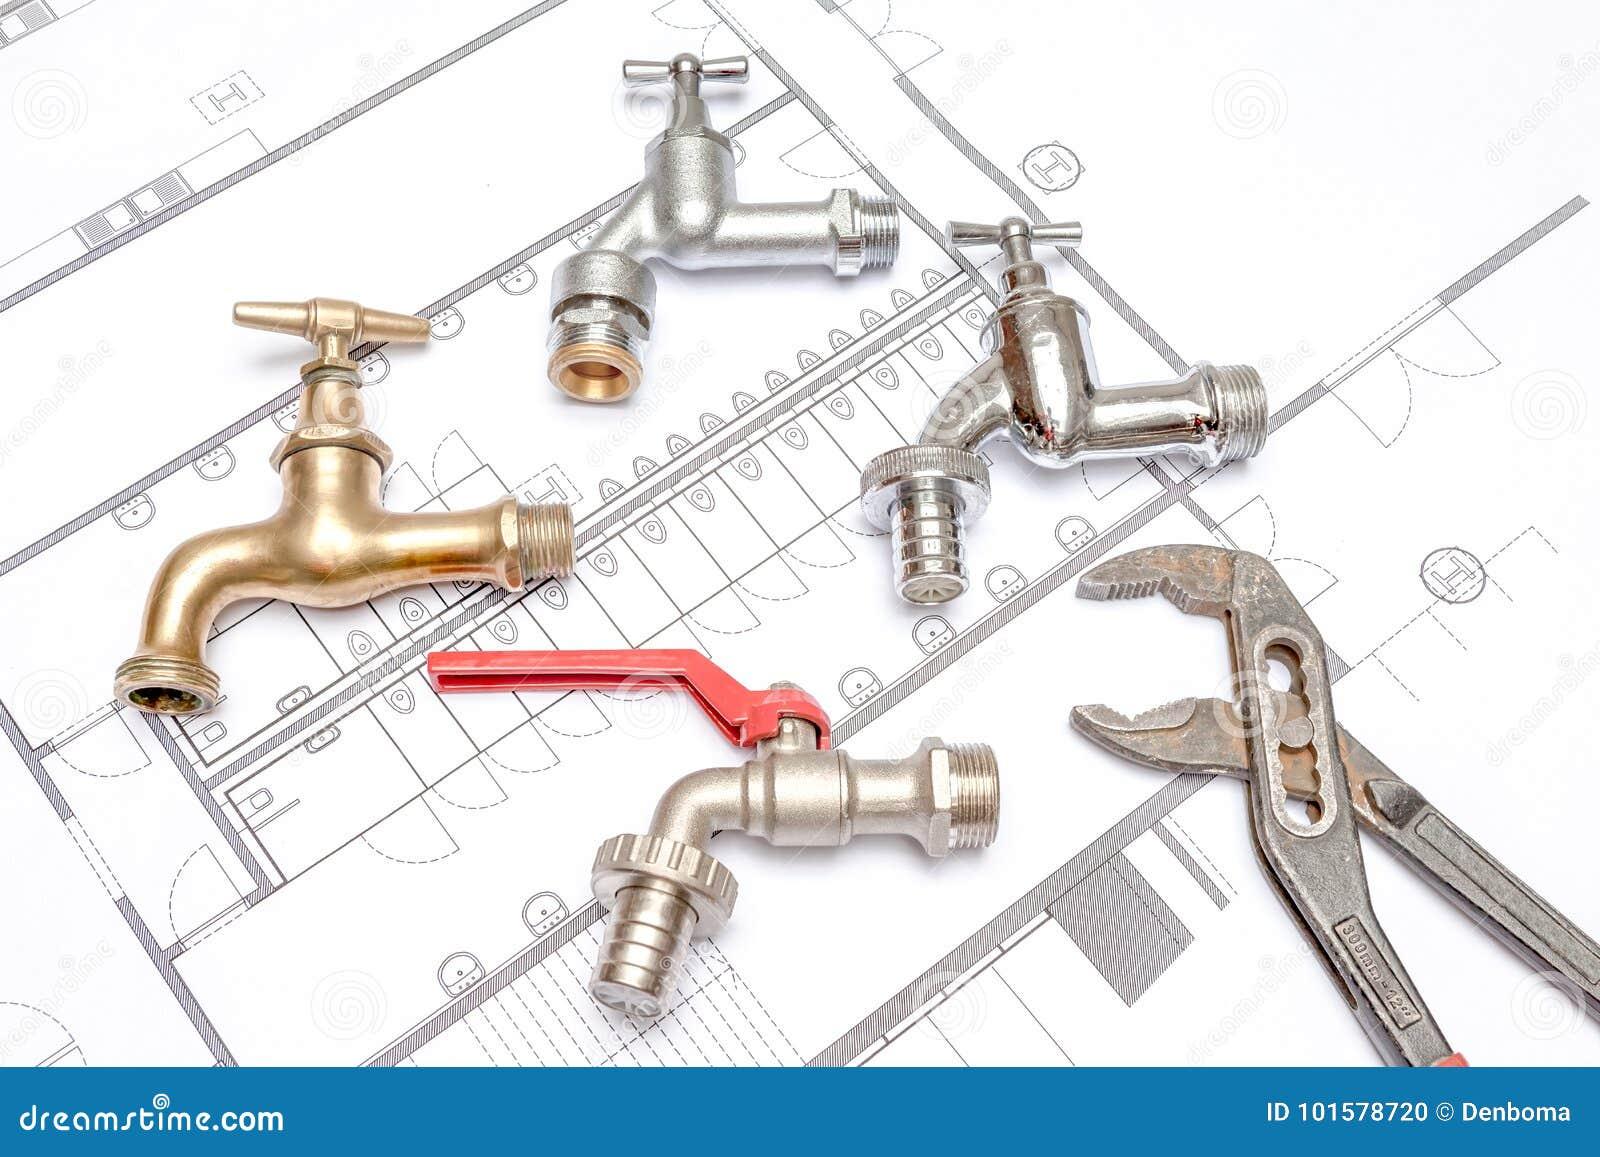 plumber plans - Monza berglauf-verband com